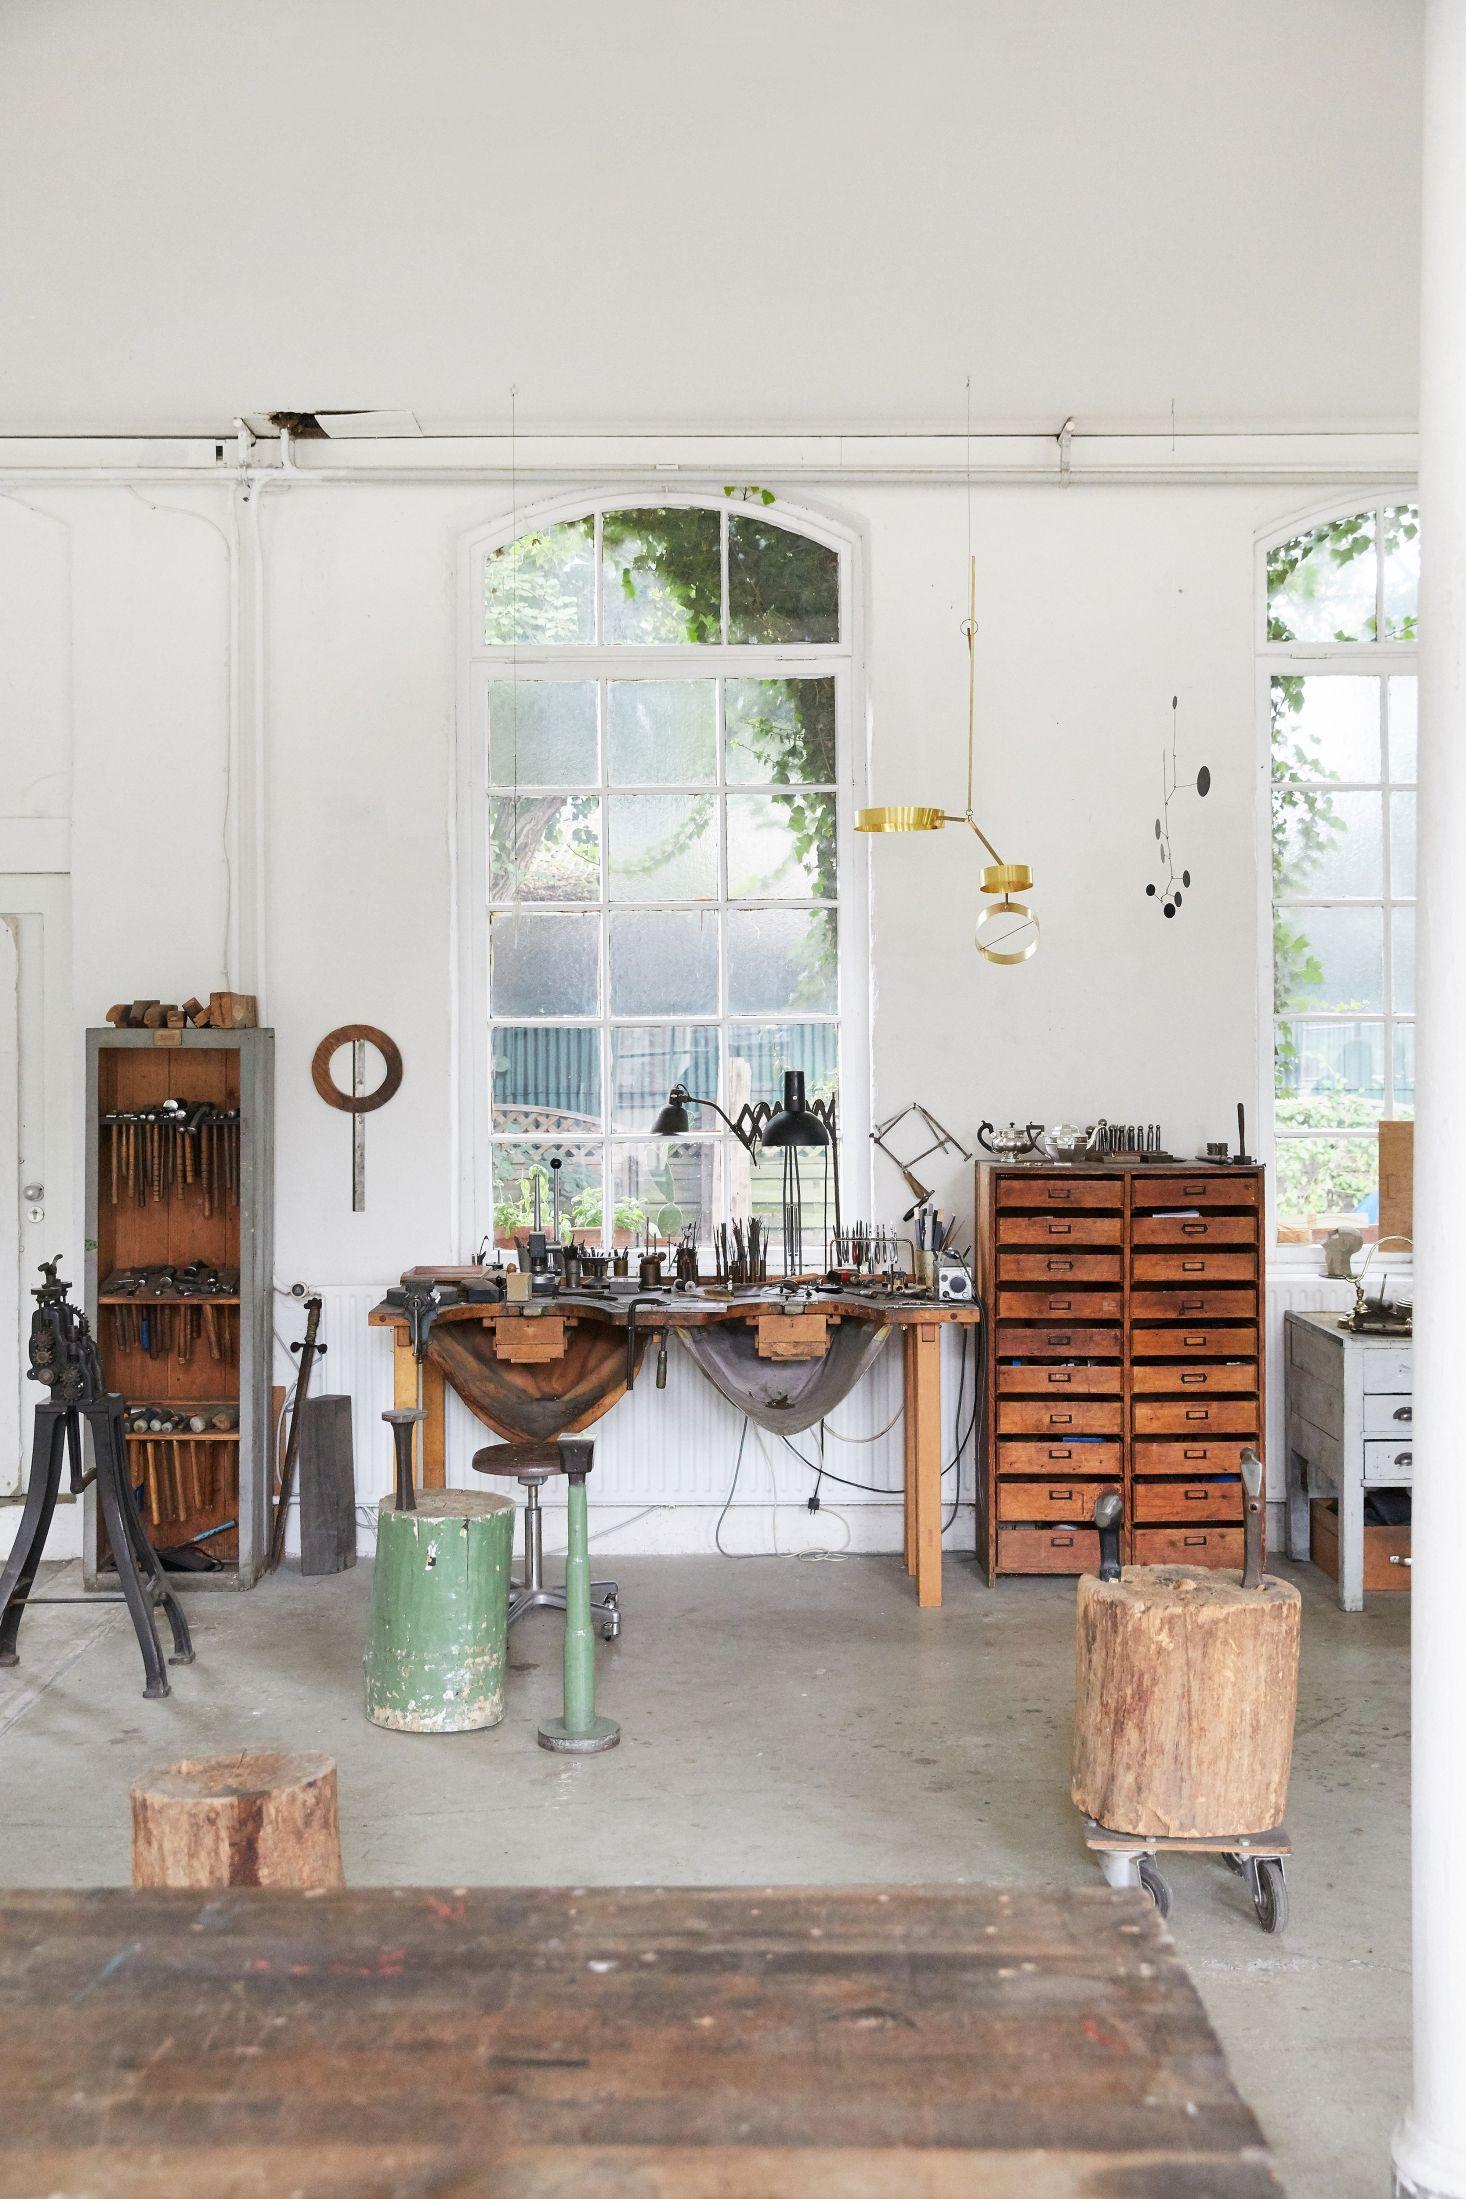 my dream workspace | home | Pinterest | Studio, Bricks and Industrial